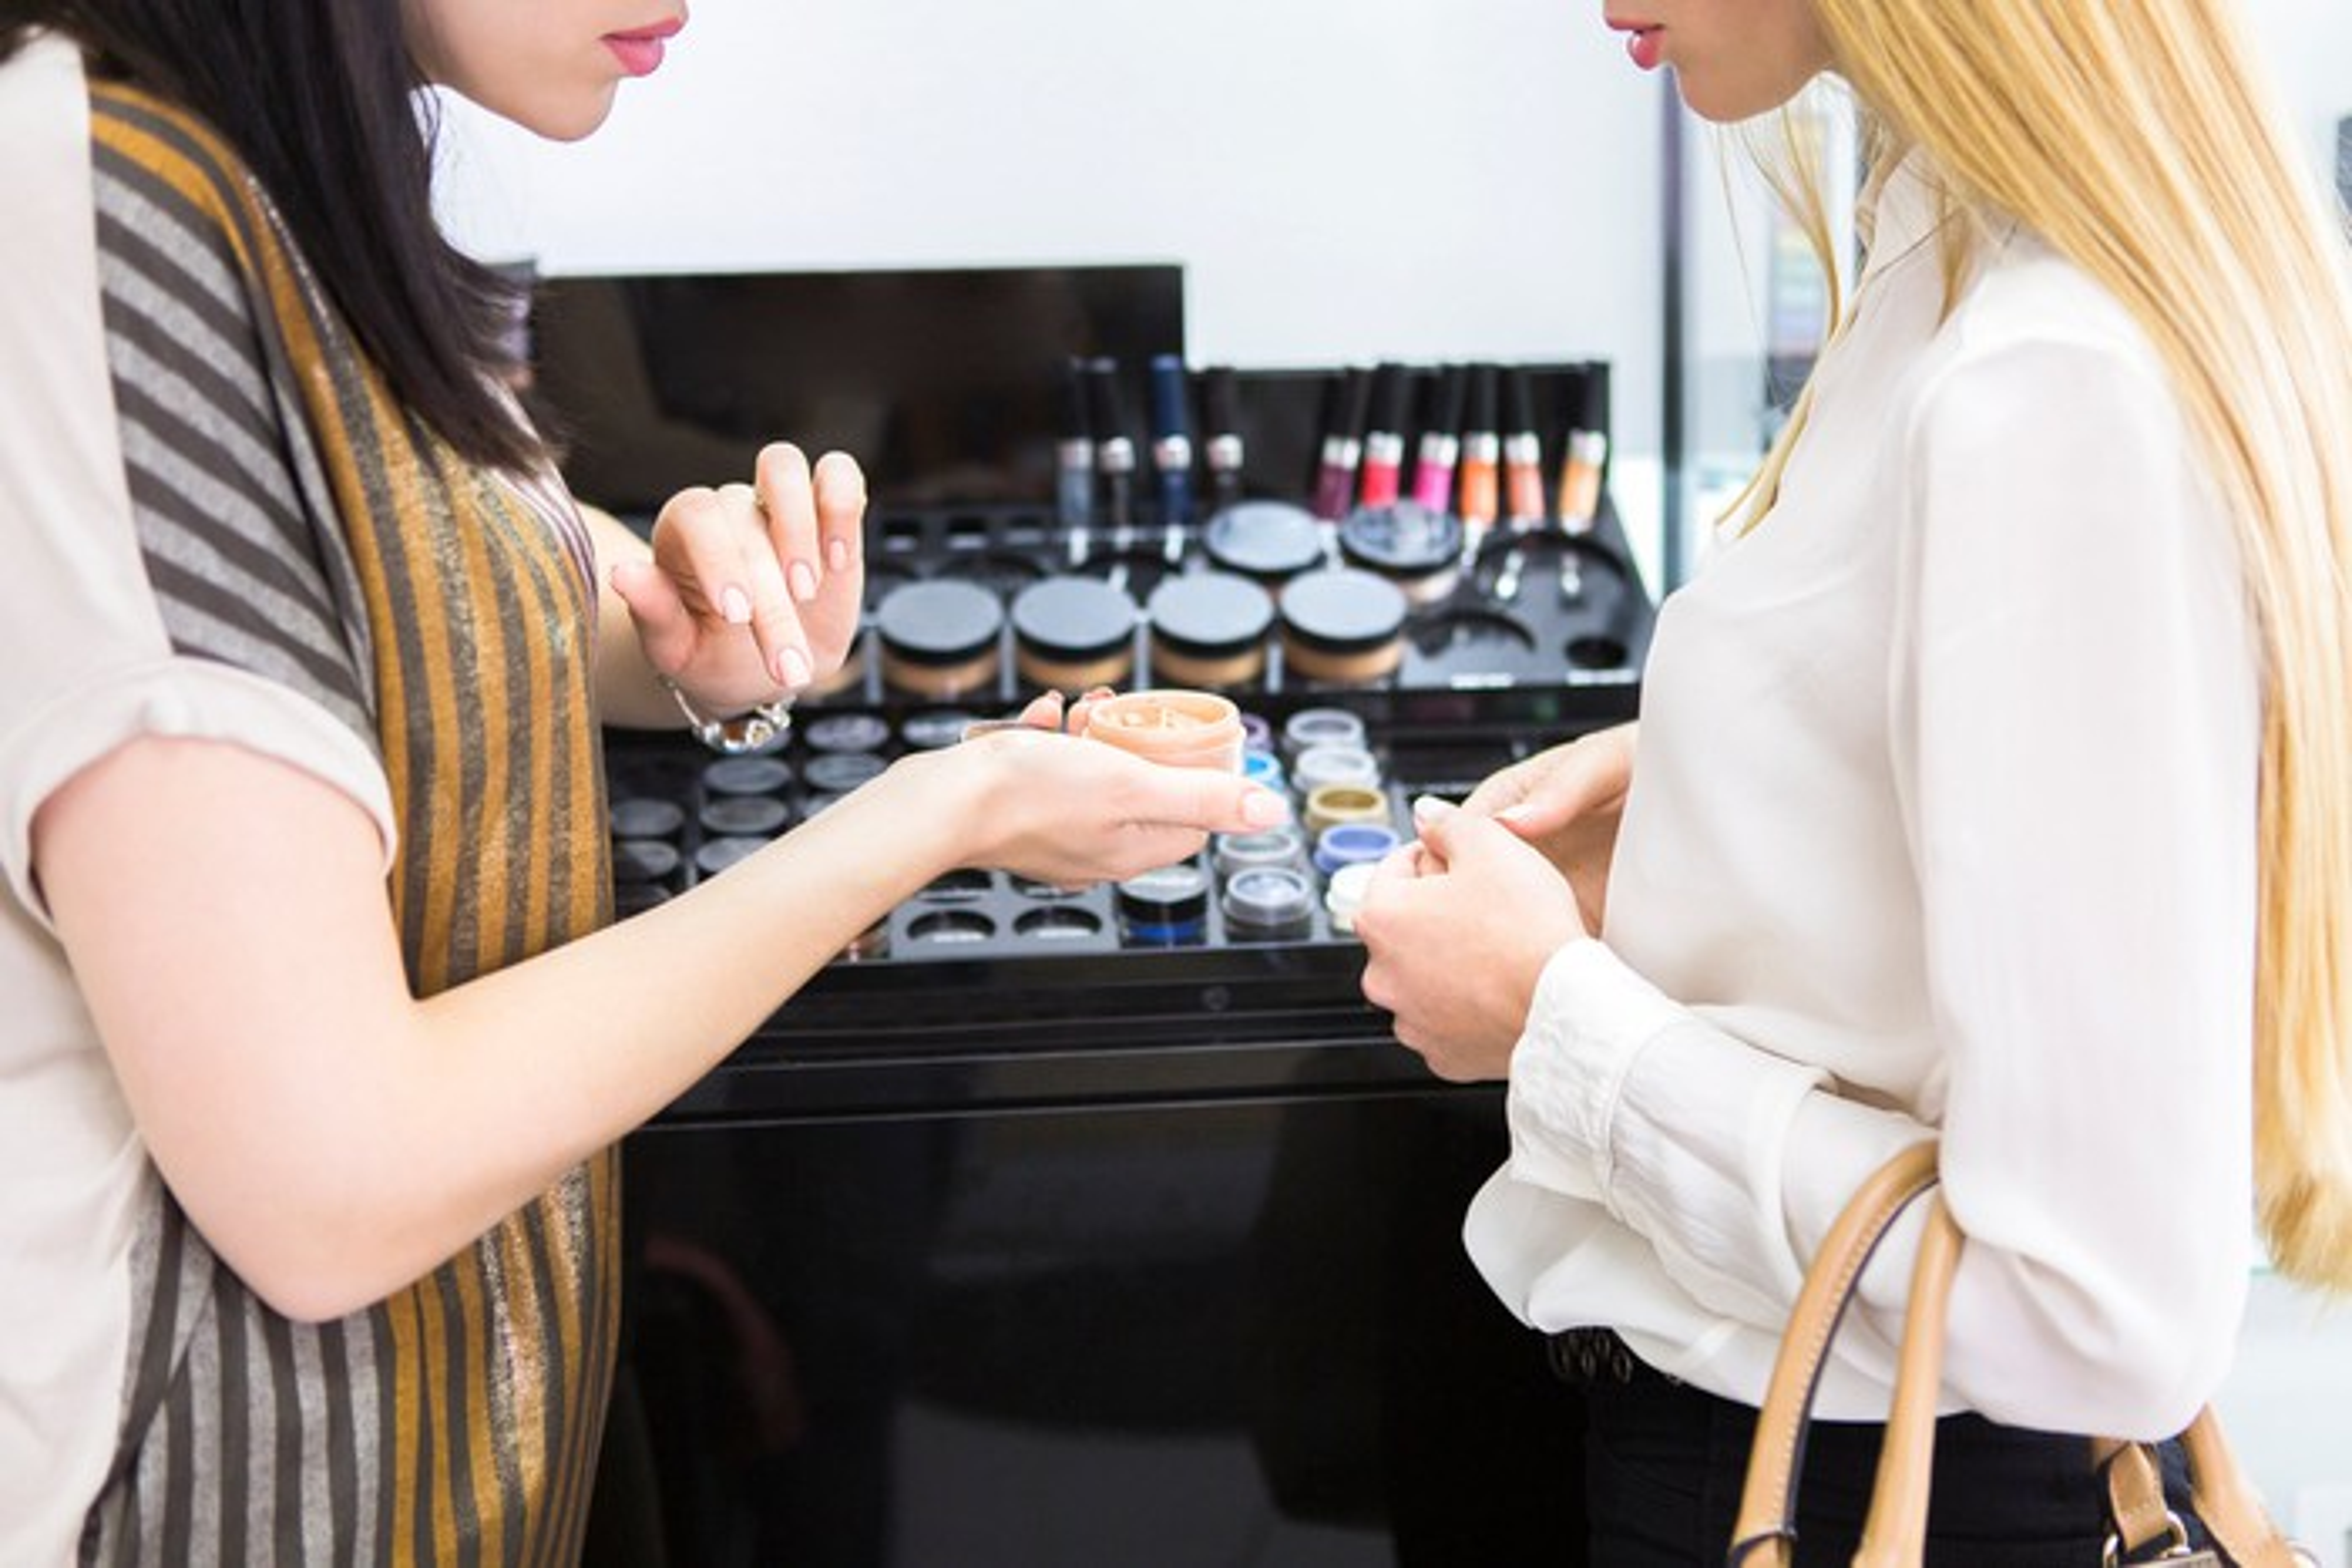 Two women sampling beauty products.